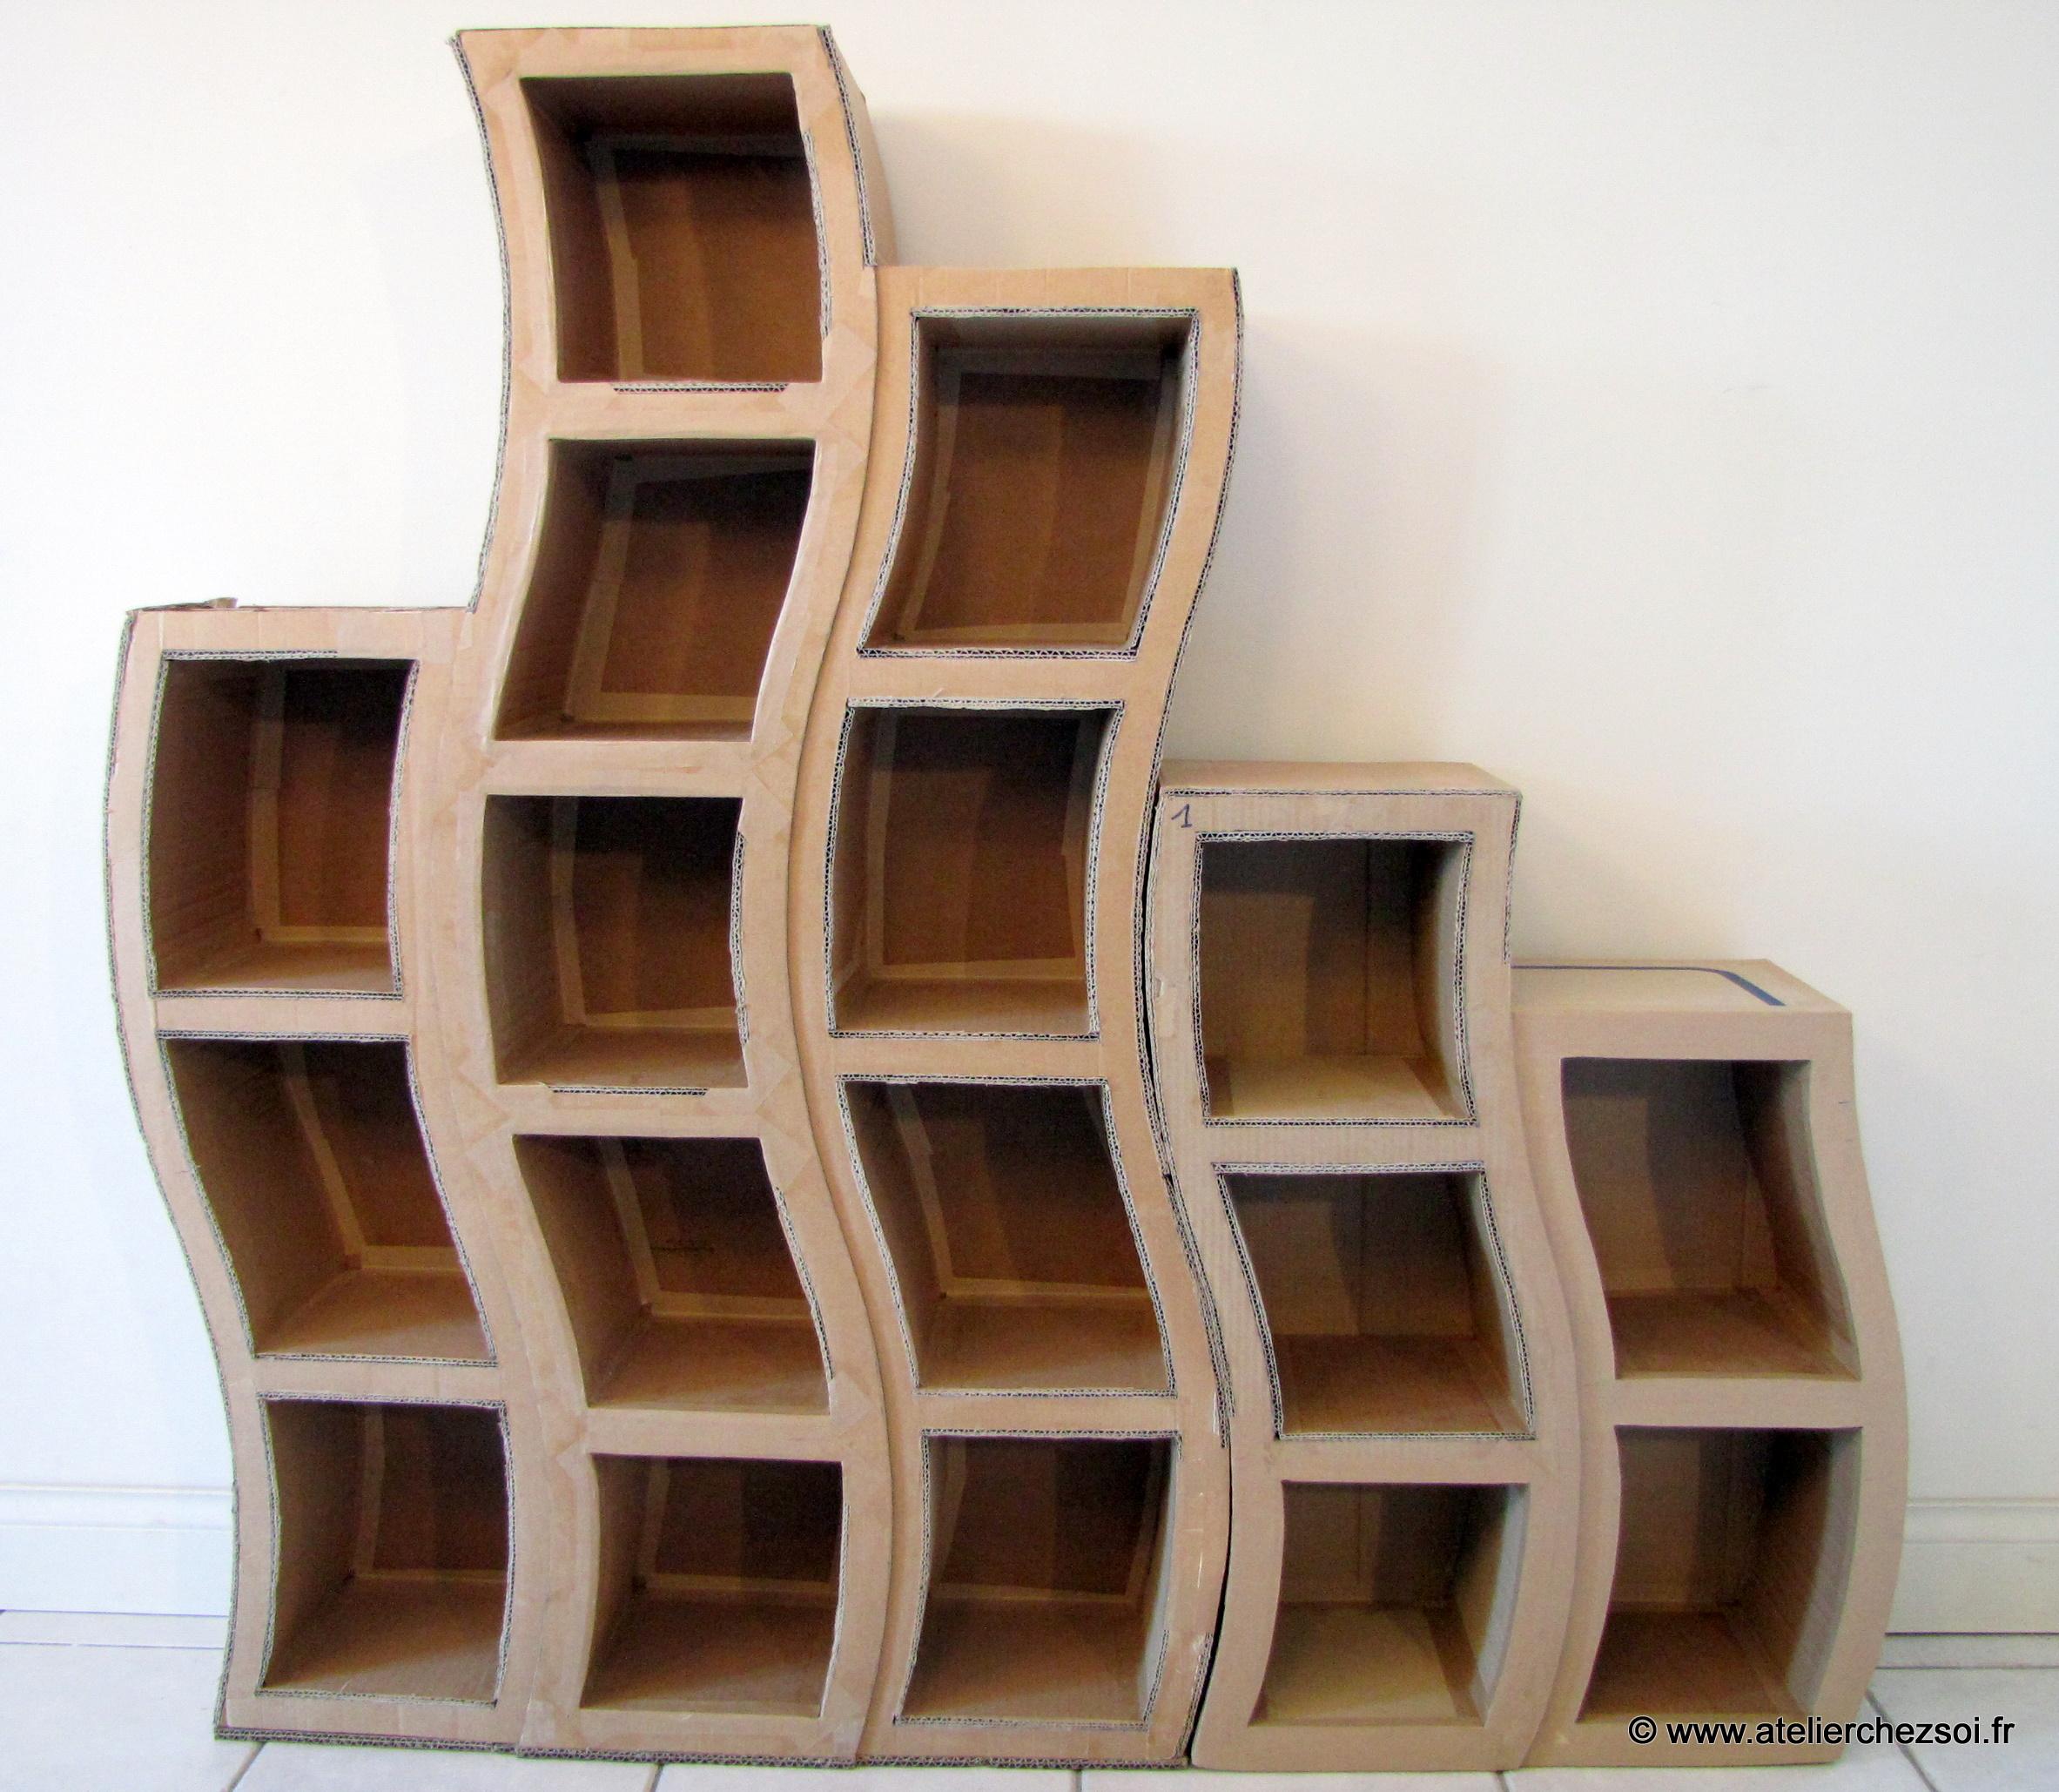 patron de meuble en carton grande etag re hondule mille. Black Bedroom Furniture Sets. Home Design Ideas